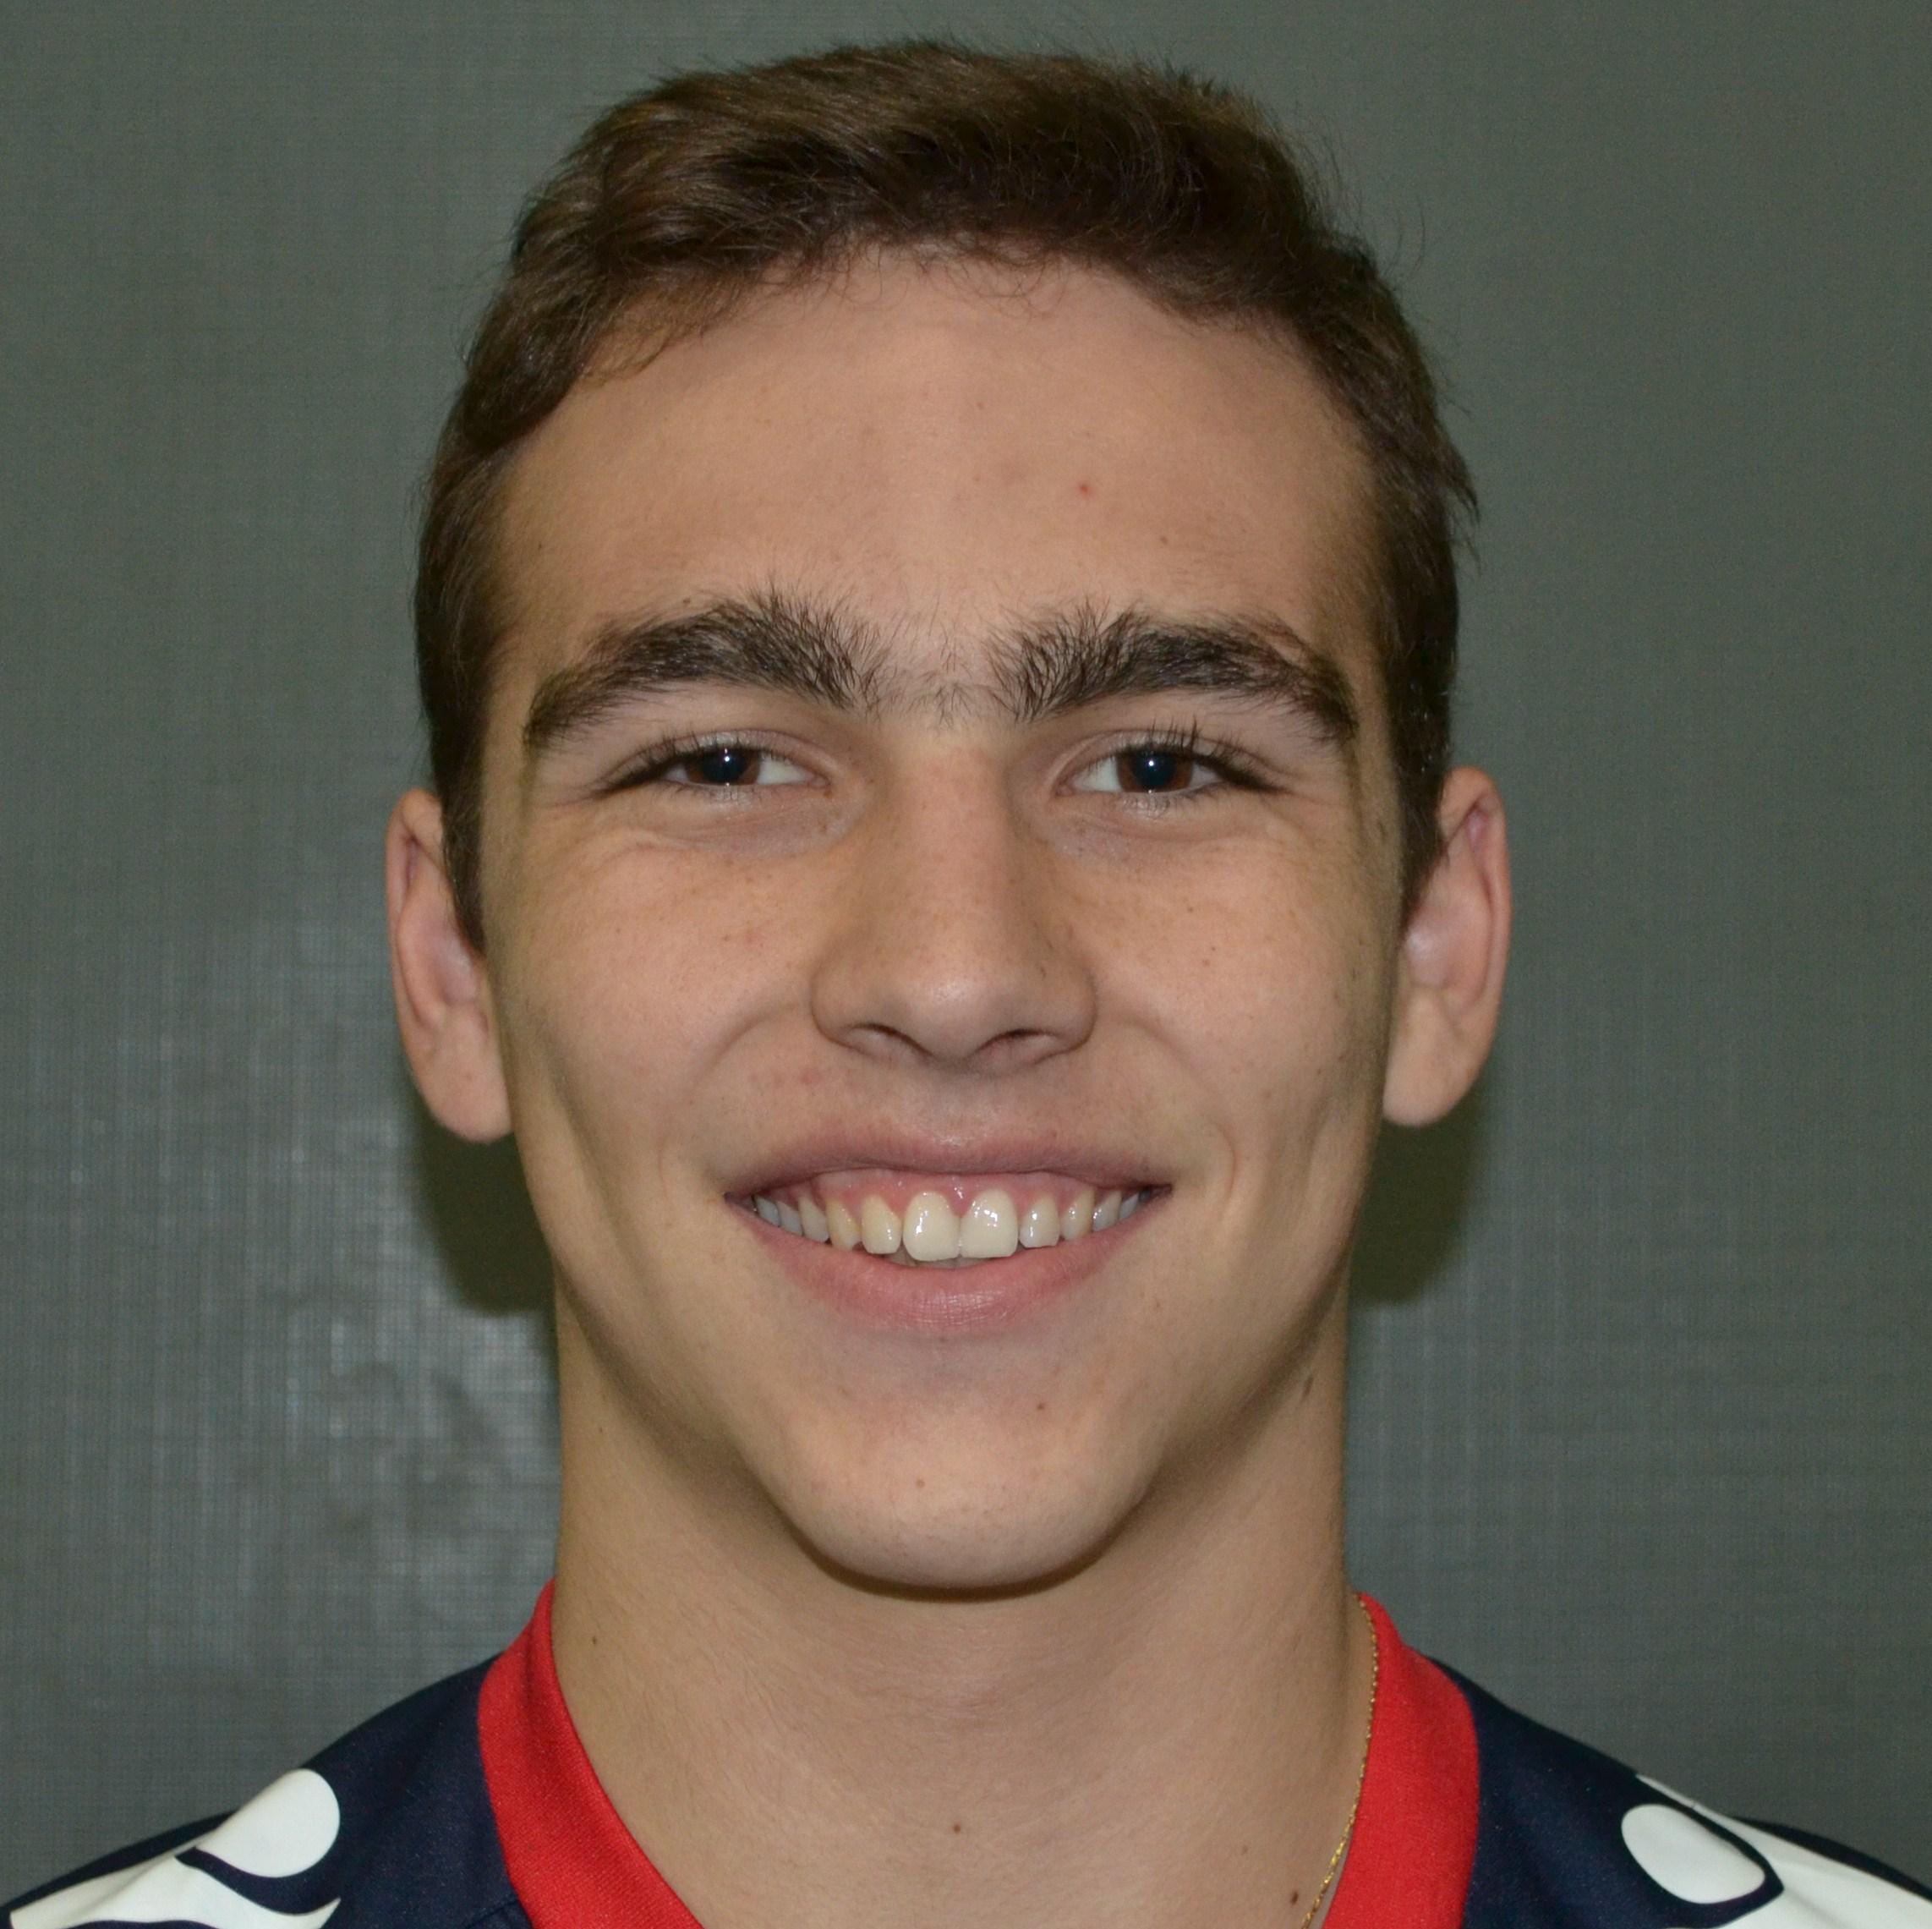 Esteban Villarreal Soltau